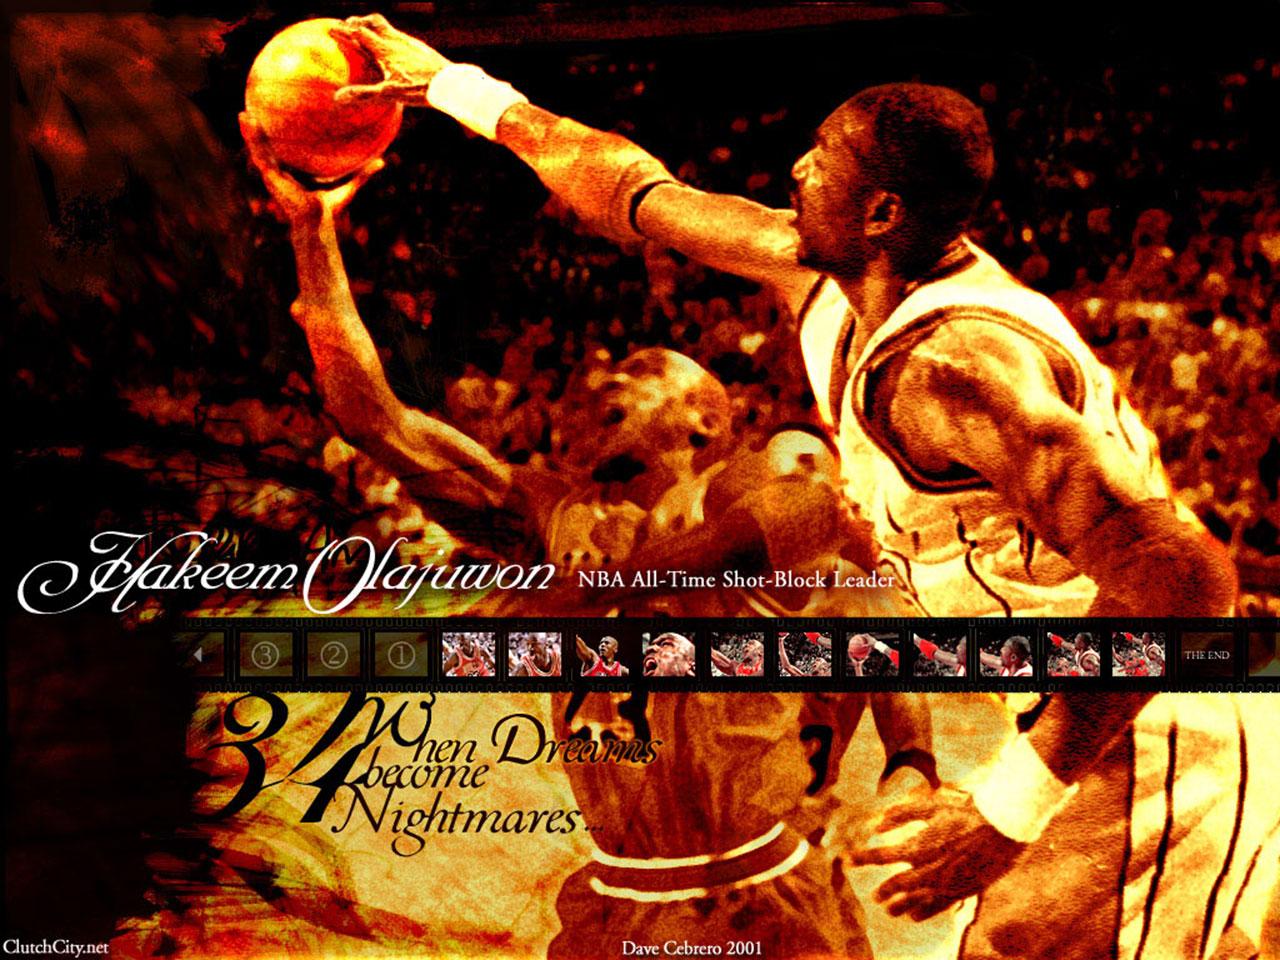 Jordan Wallpaper Basketball Wallpapers at BasketWallpaperscom 1280x960